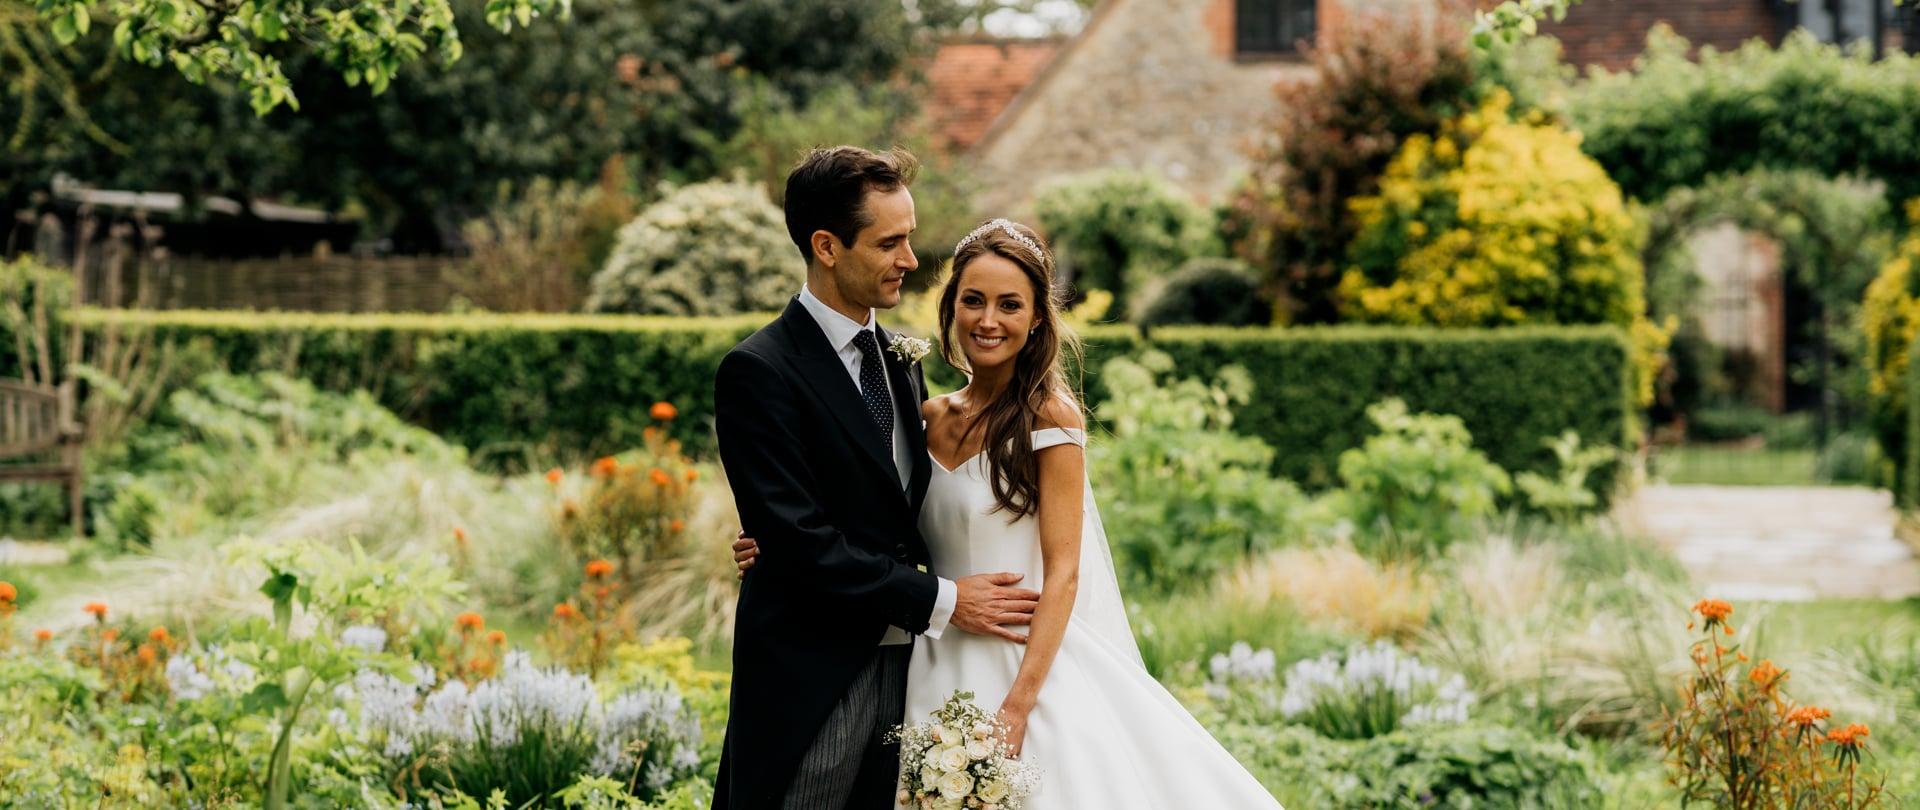 Felicity & William Wedding Video Filmed at Oxfordshire, England